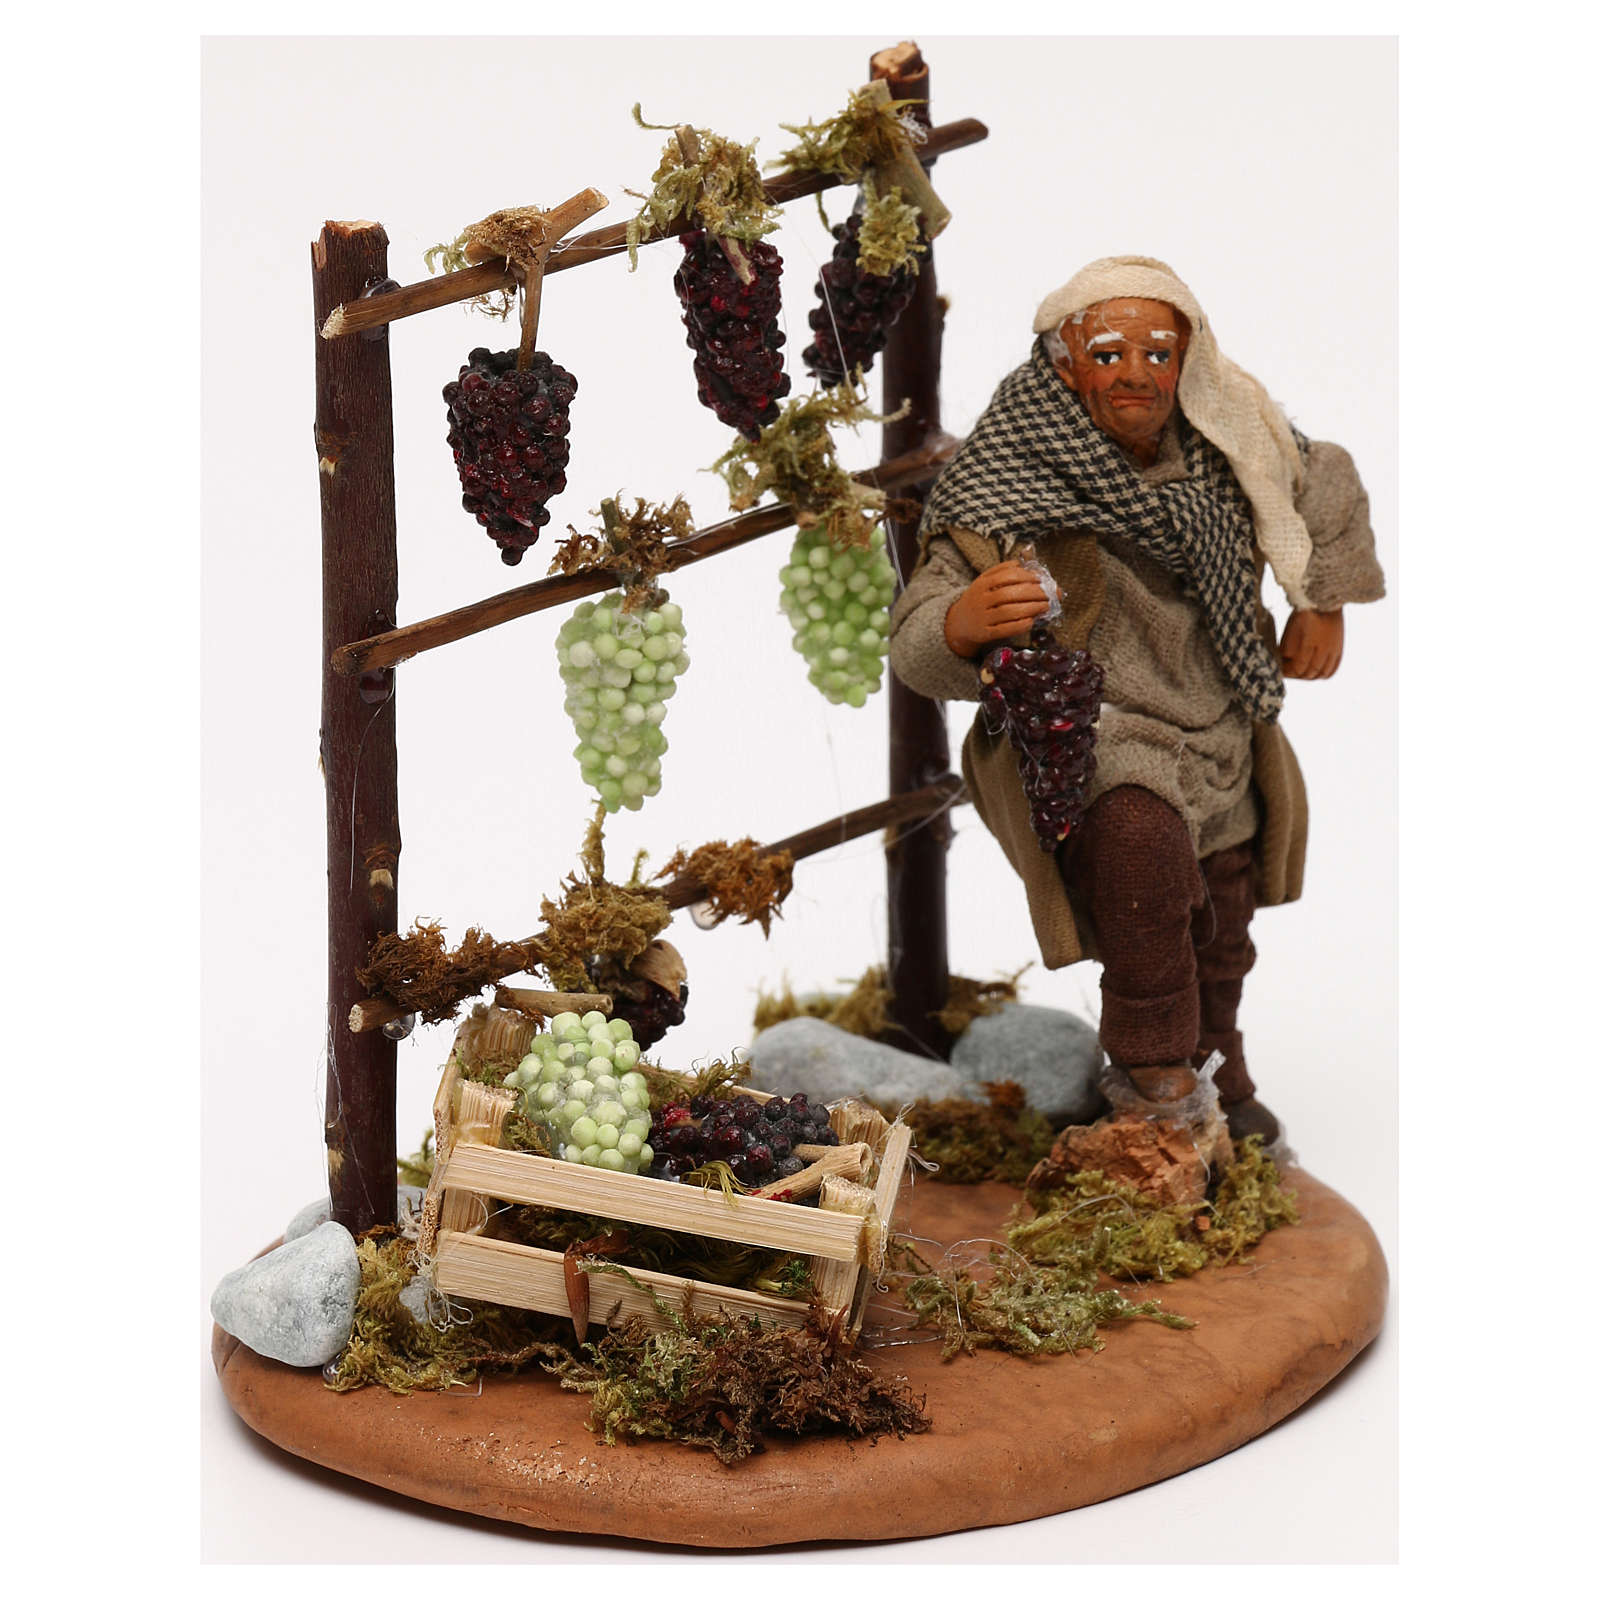 Man with vines, Neapolitan Nativity scene 10 cm 4